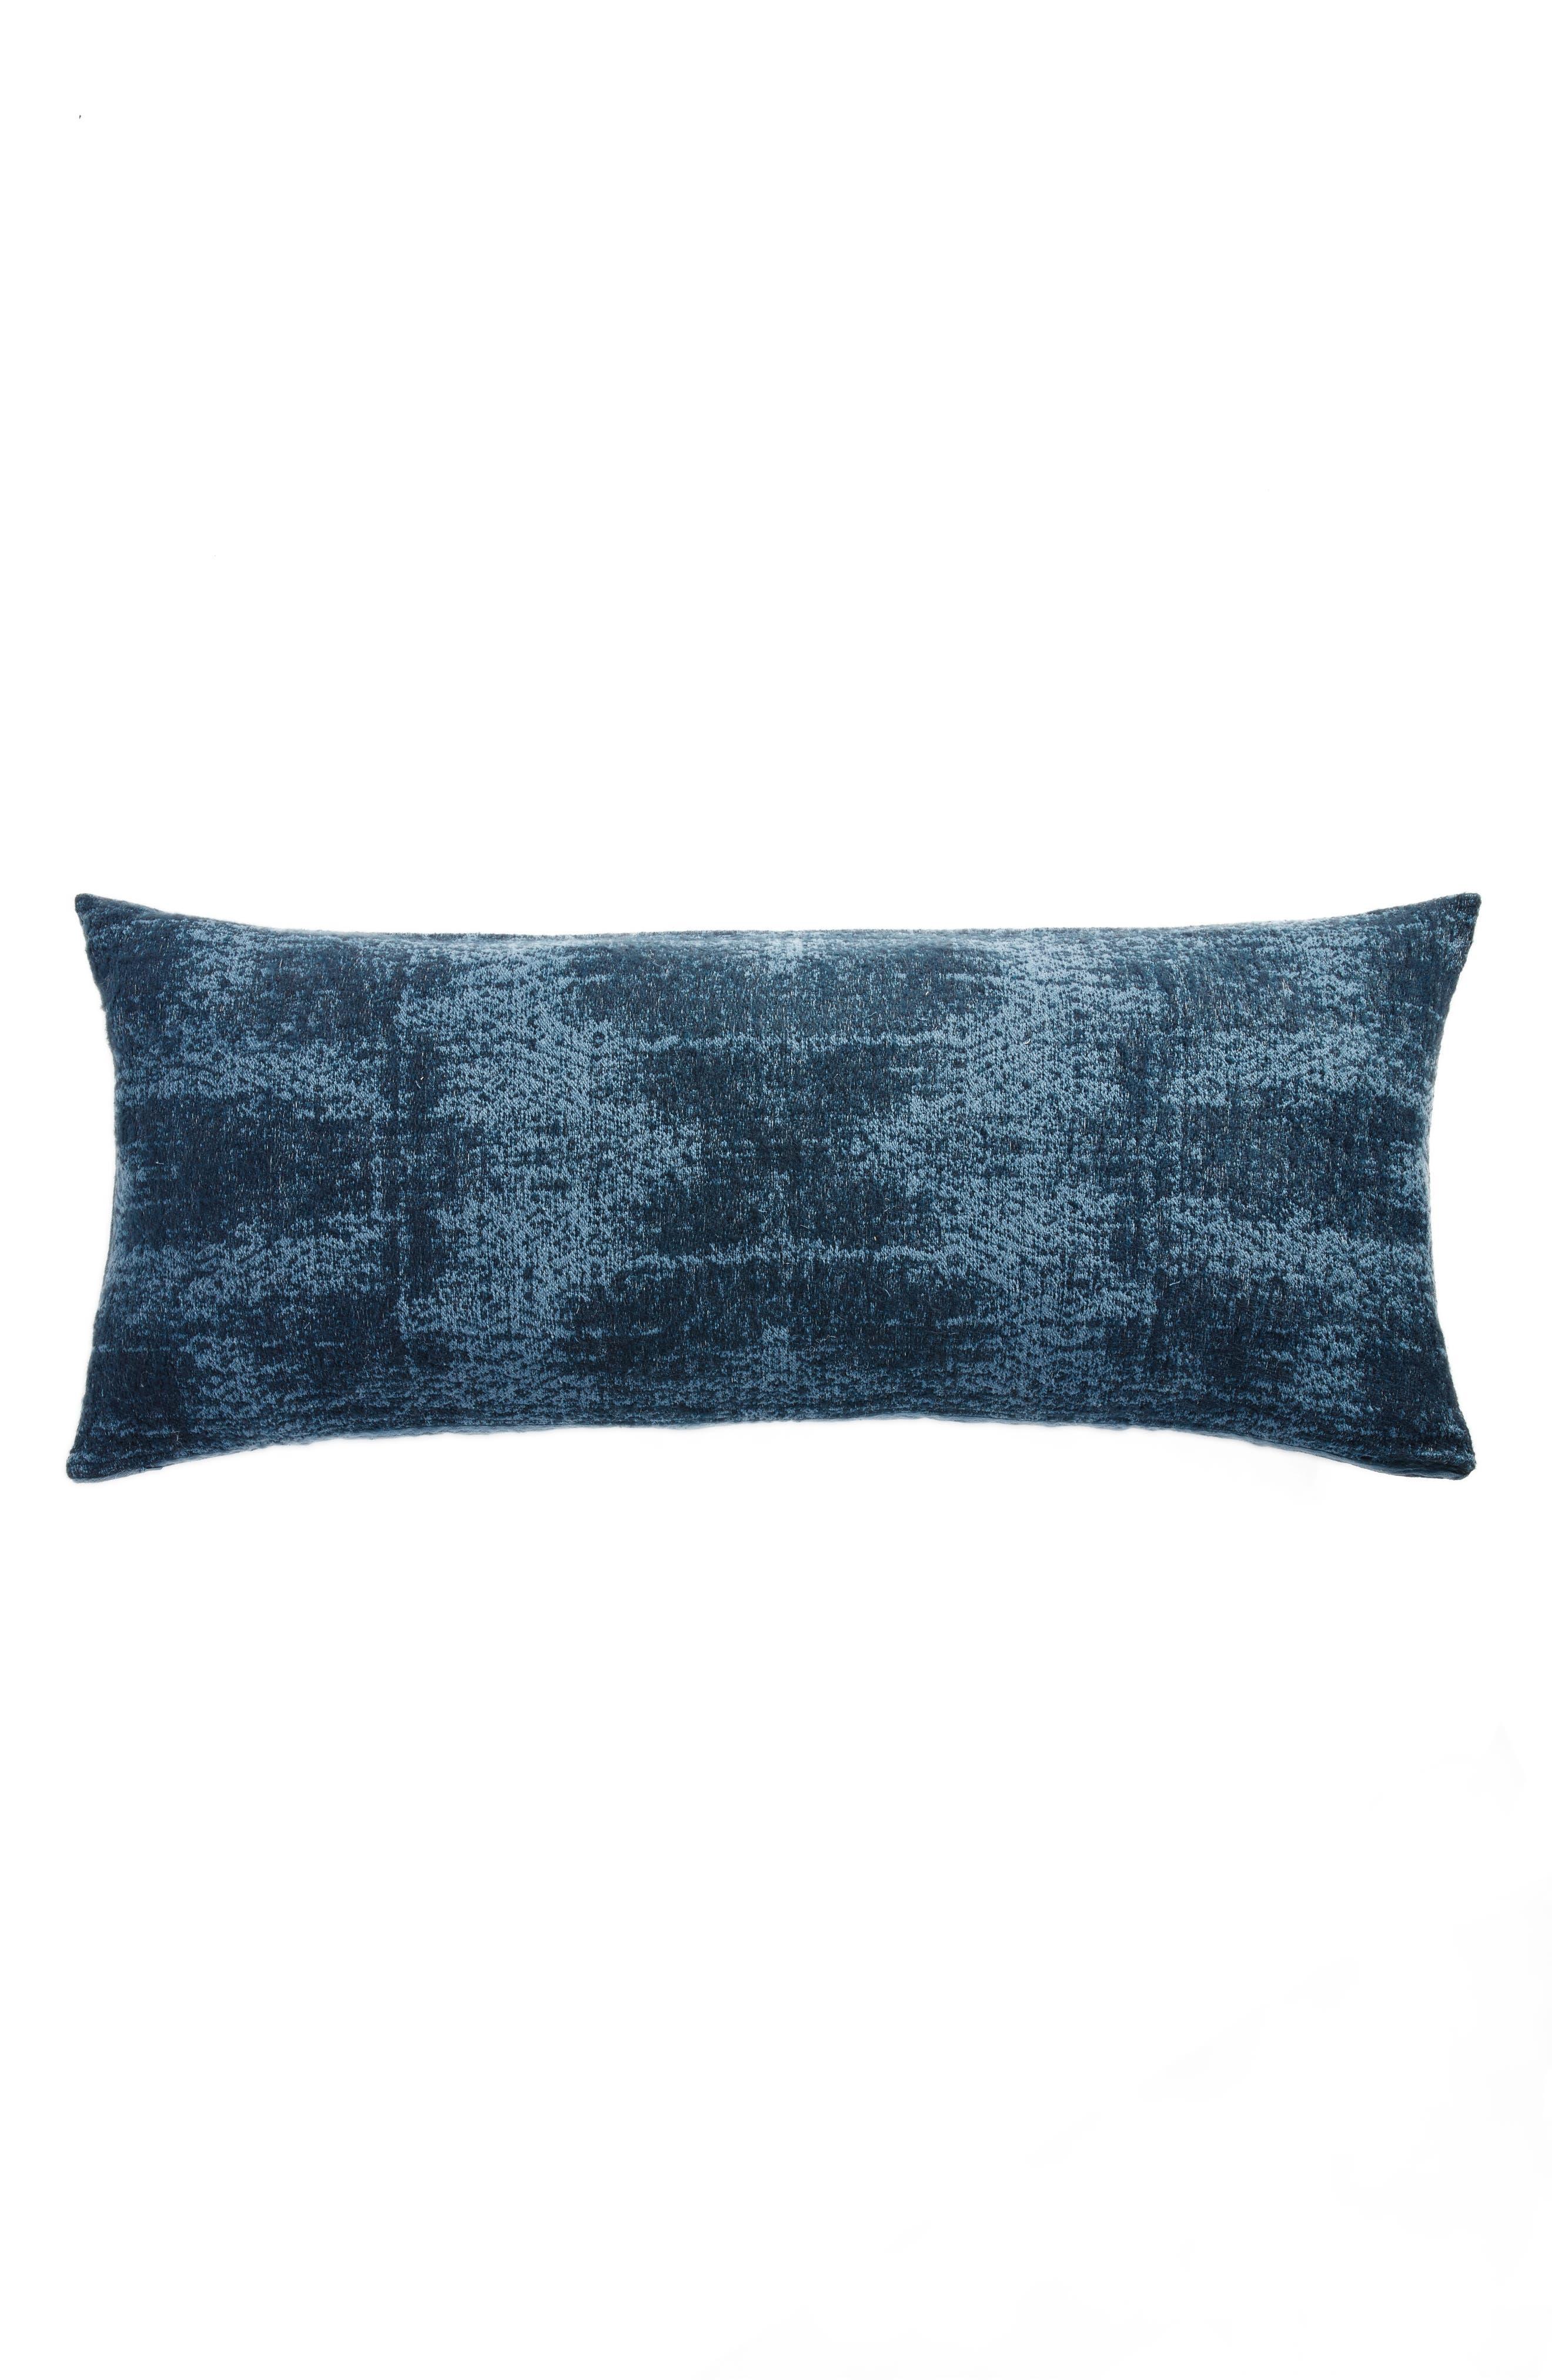 Main Image - Treasure & Bond Distressed Geo Accent Pillow